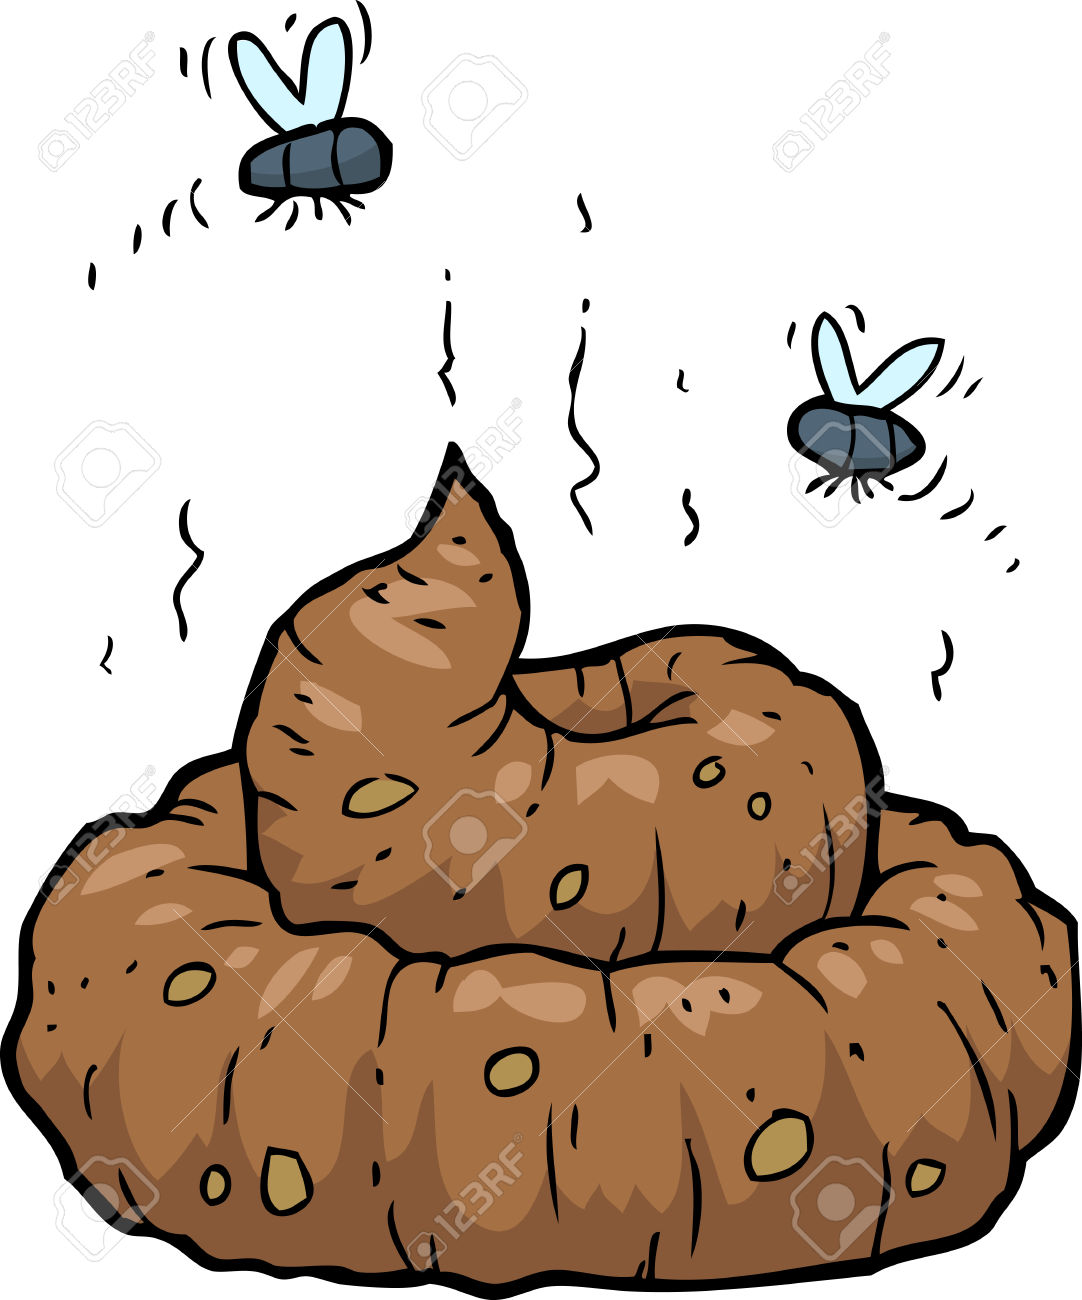 41678371-poop-on-a-white-background-vector-illustration-stock-vector-poop-cartoon-shit.jpg